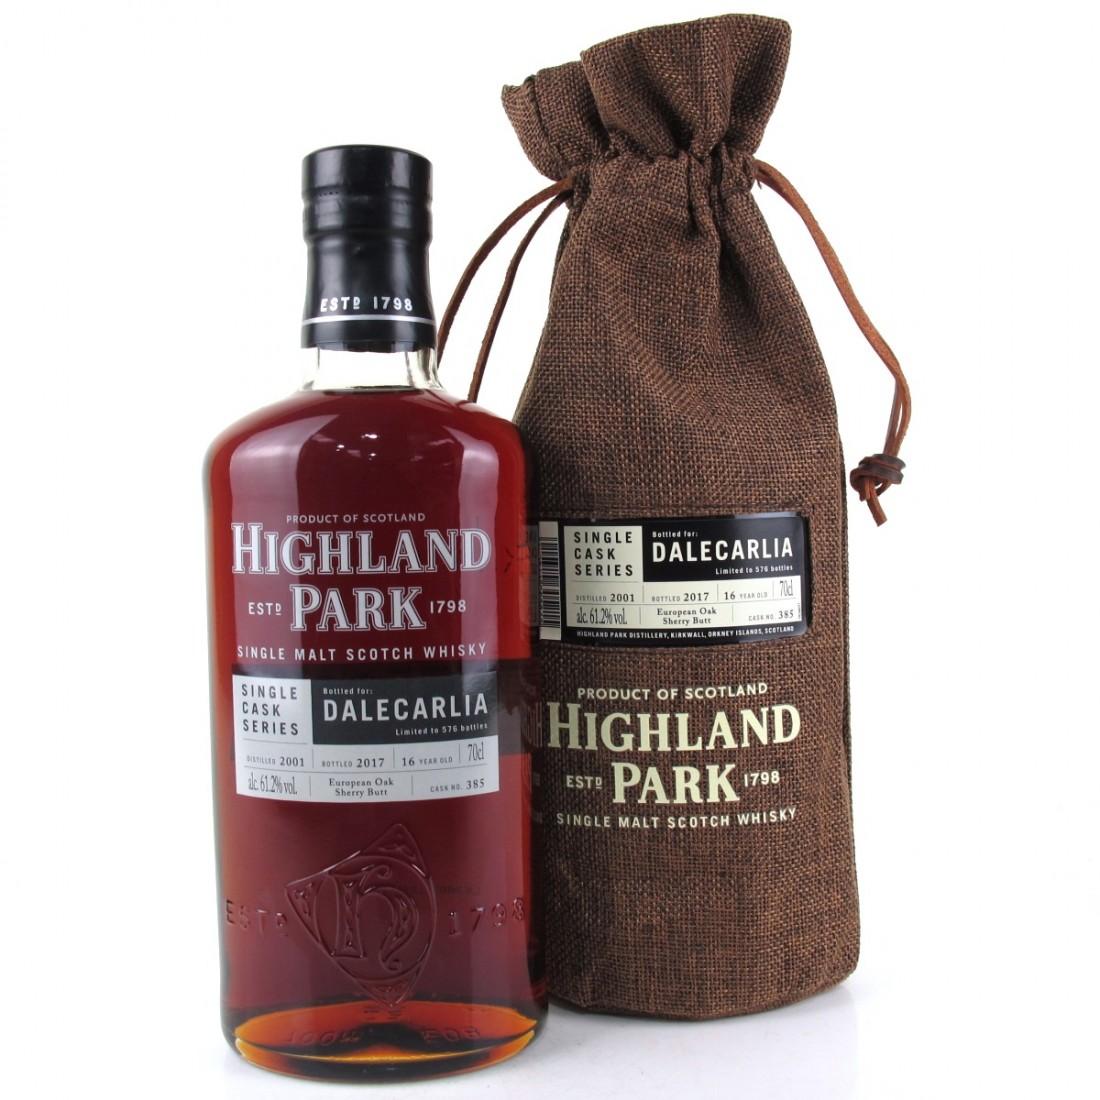 Highland Park 2001 Single Cask 16 Year Old #385 / Dalecarlia